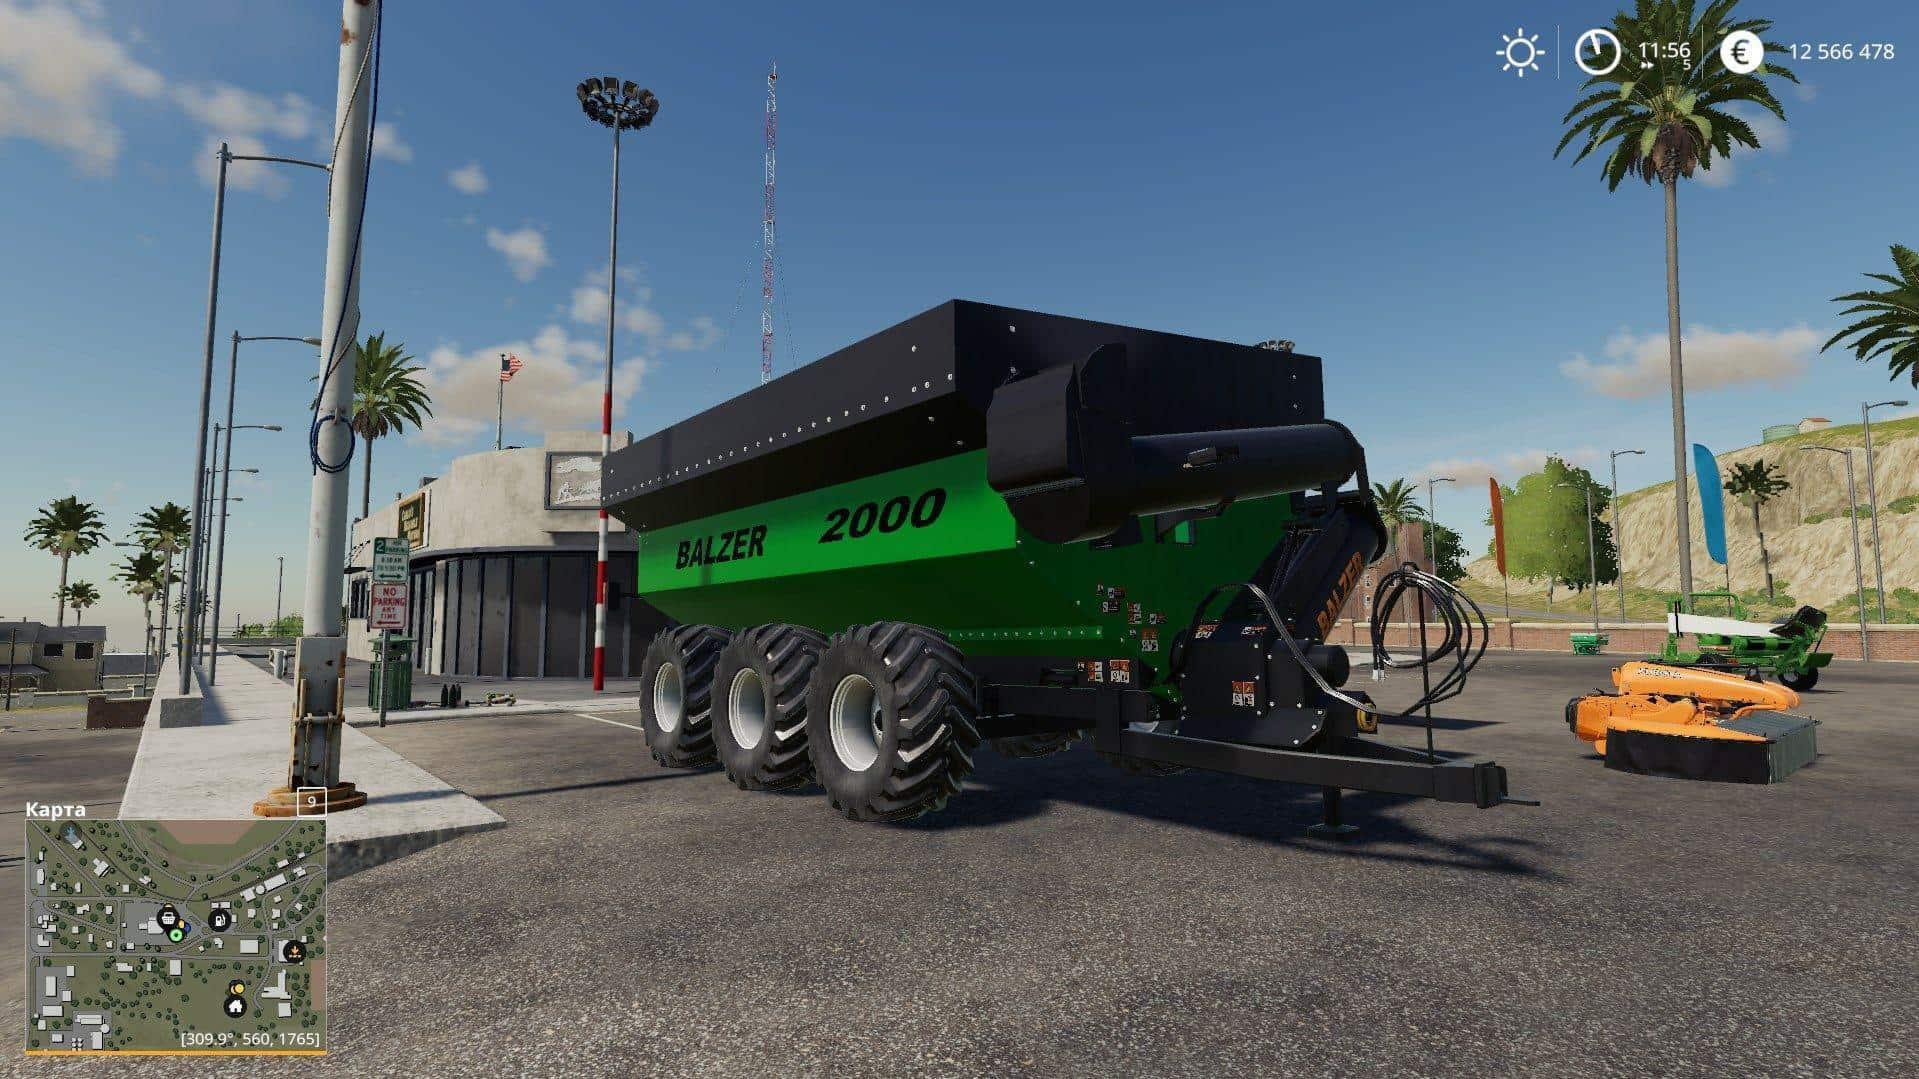 BALZER 2000 GRAIN CART v1 0 Trailer - Farming Simulator 19 Mod / FS19